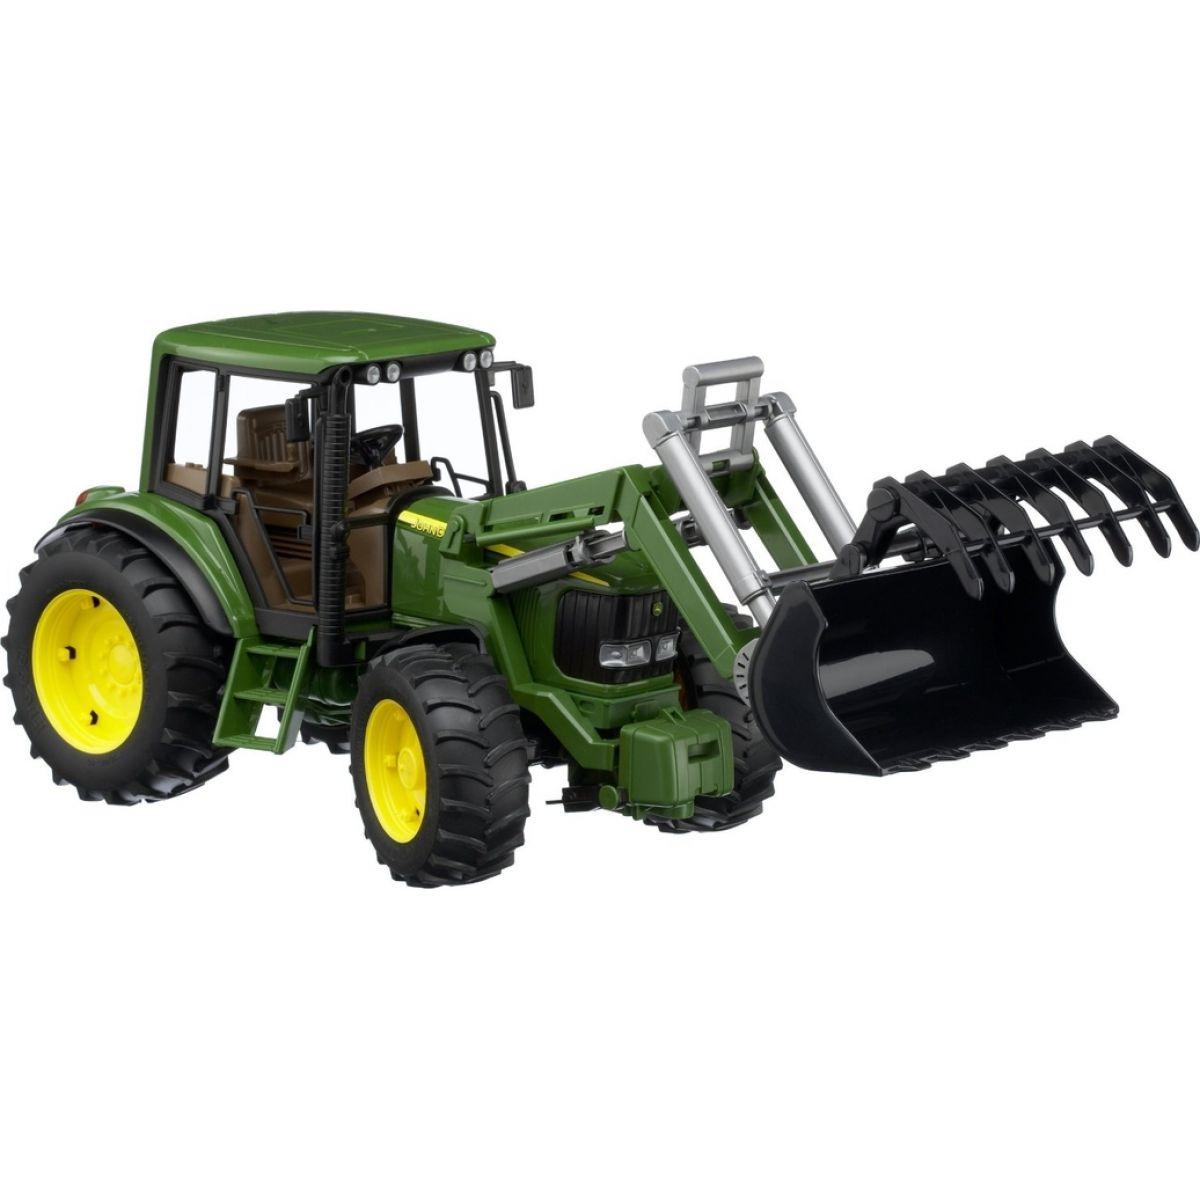 Bruder traktor john deere s radlicou